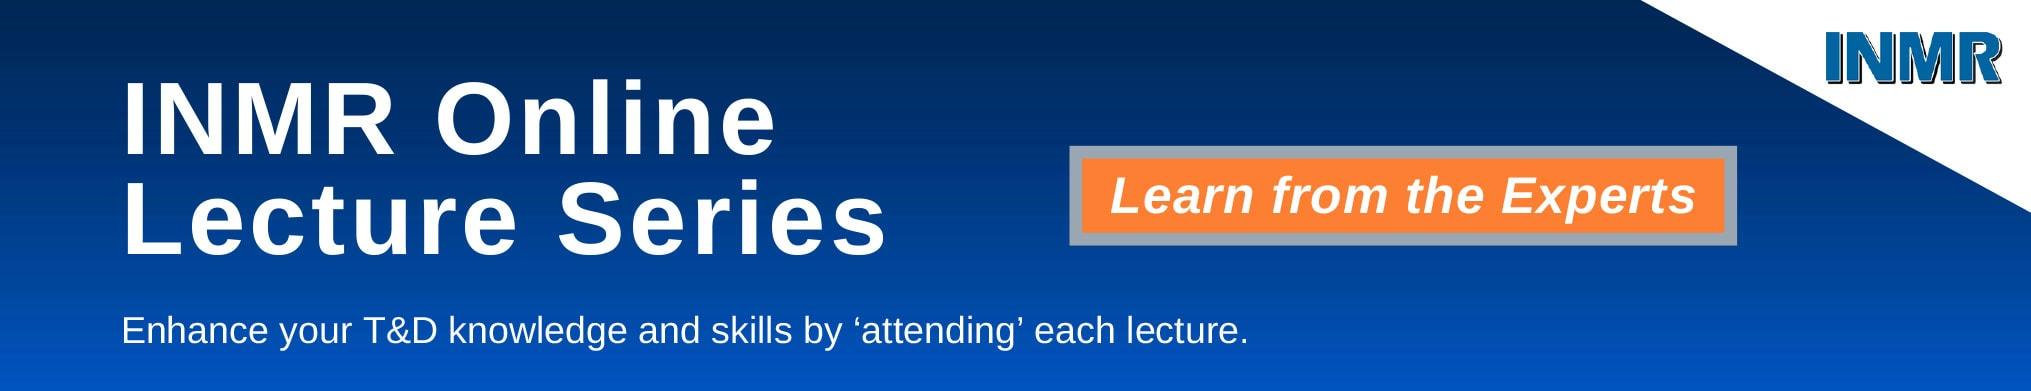 INMR Online Lecture Series